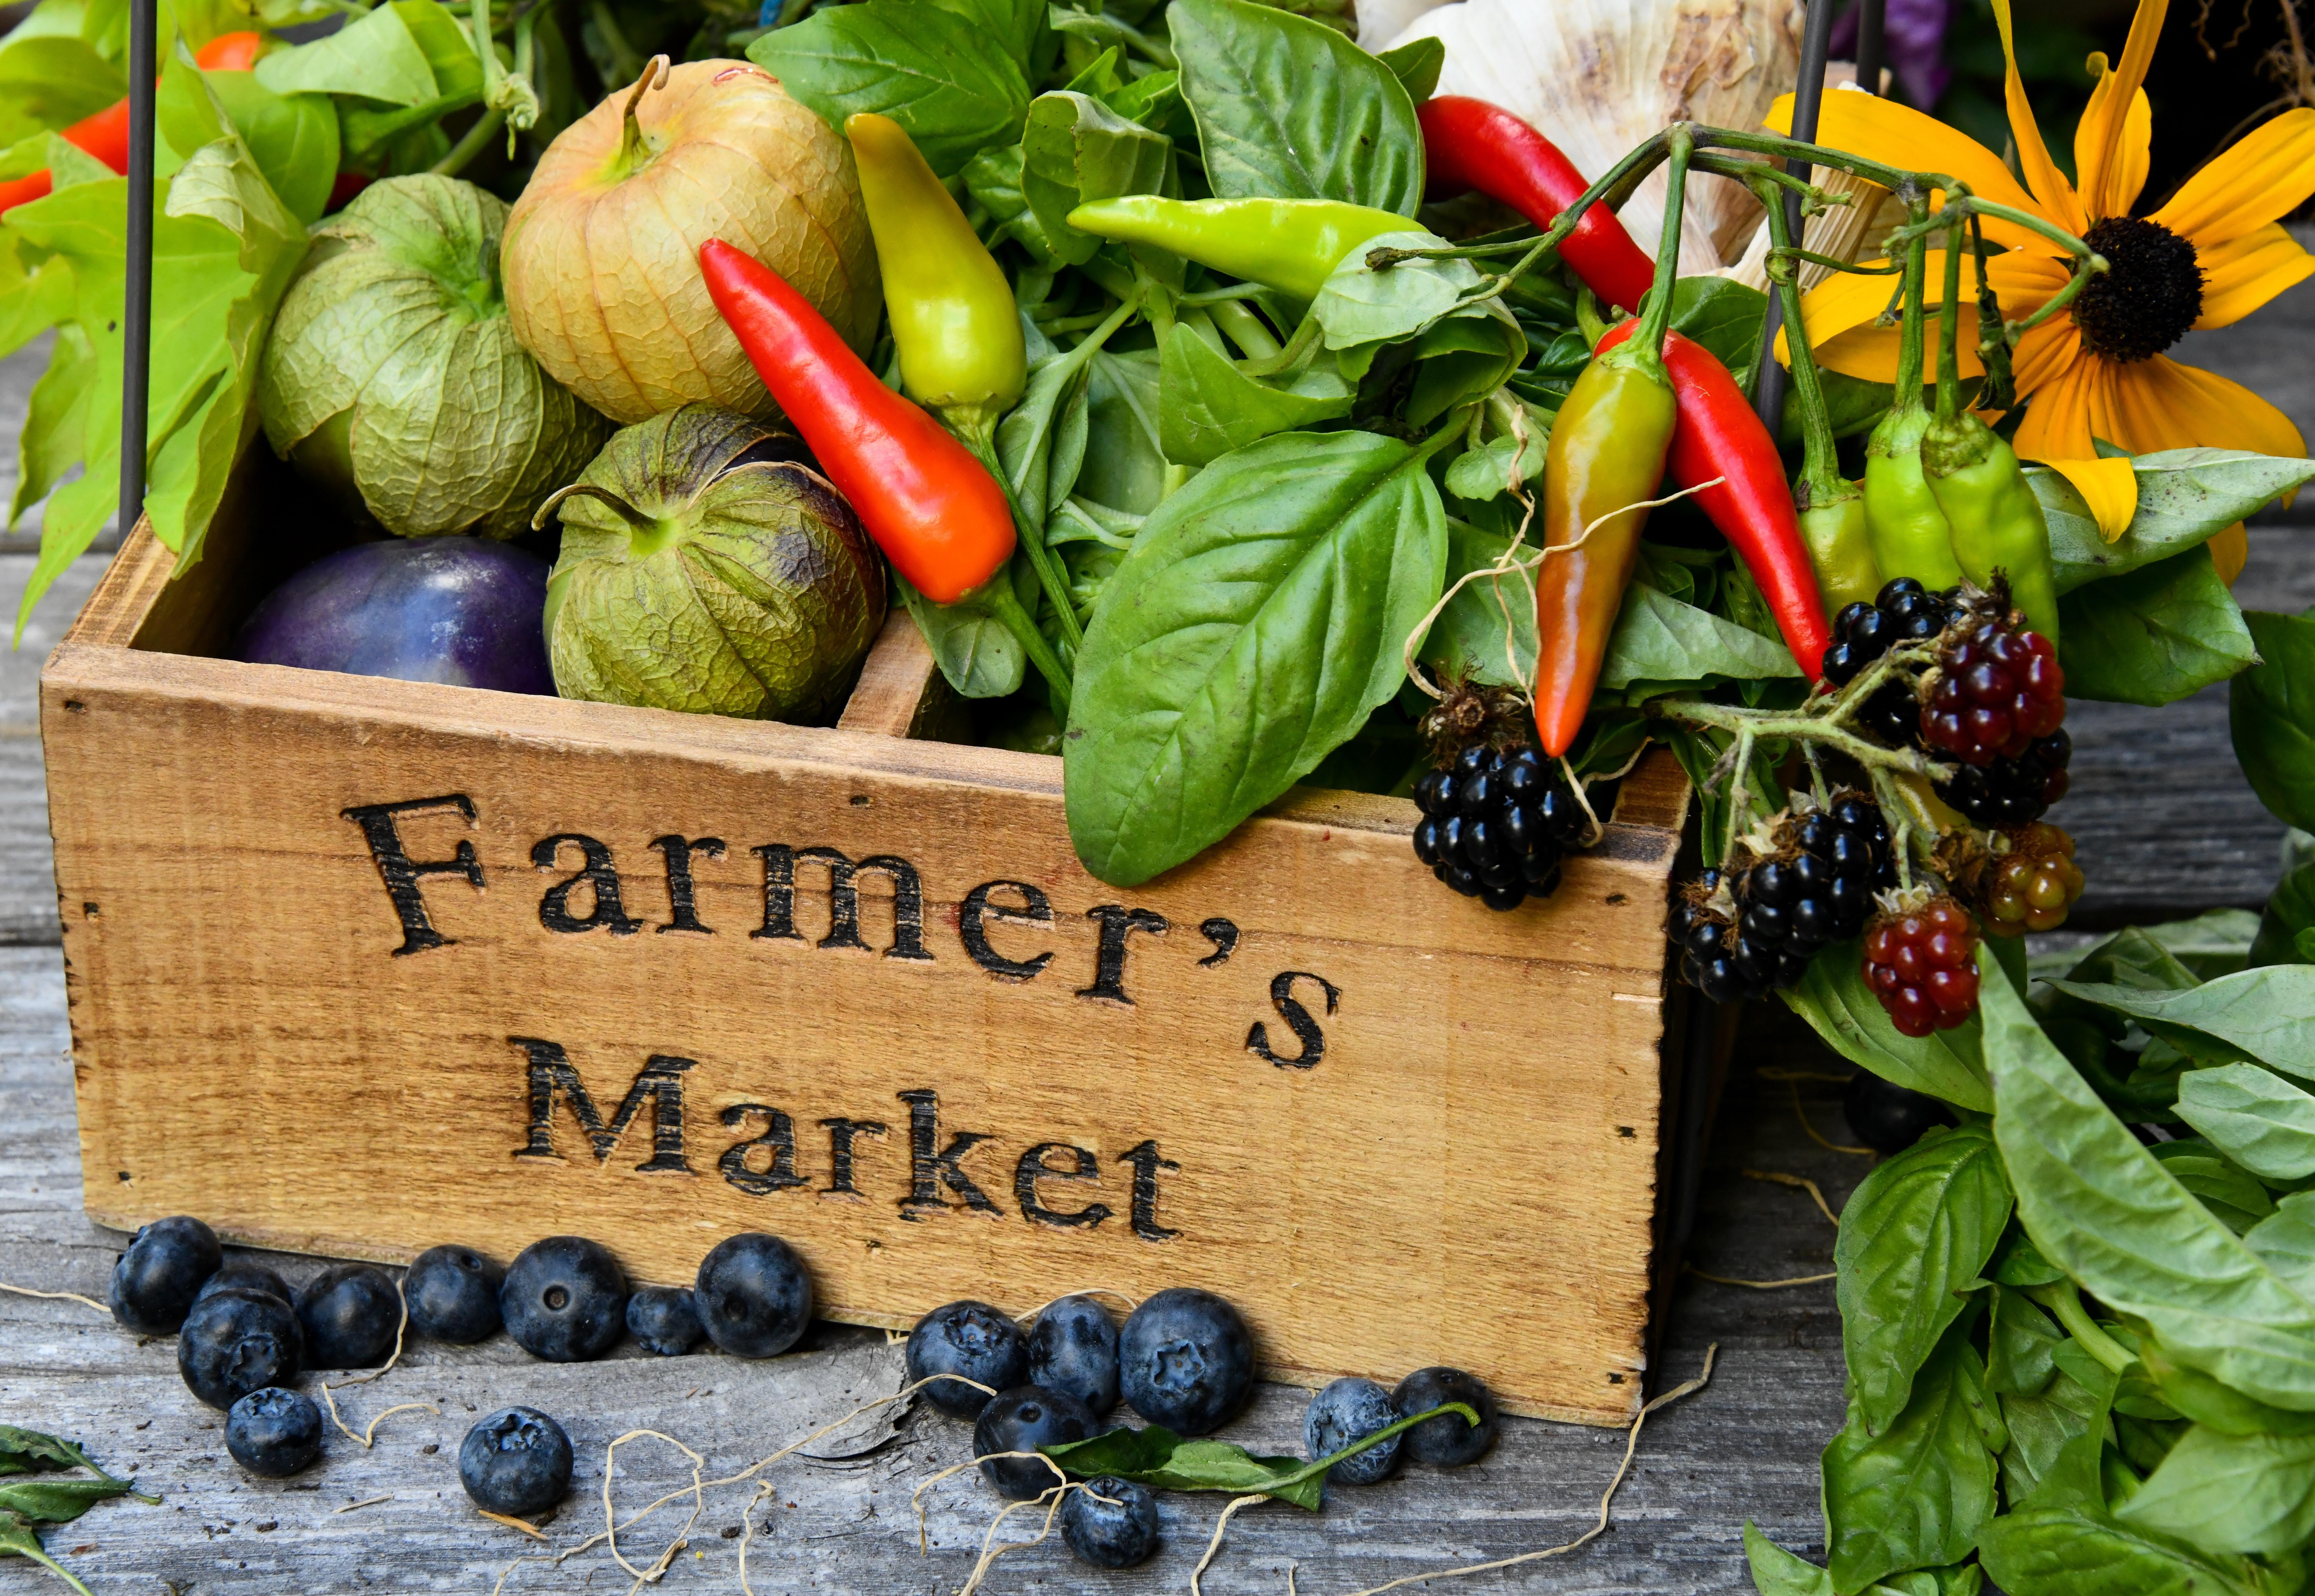 Farmers market Alabama